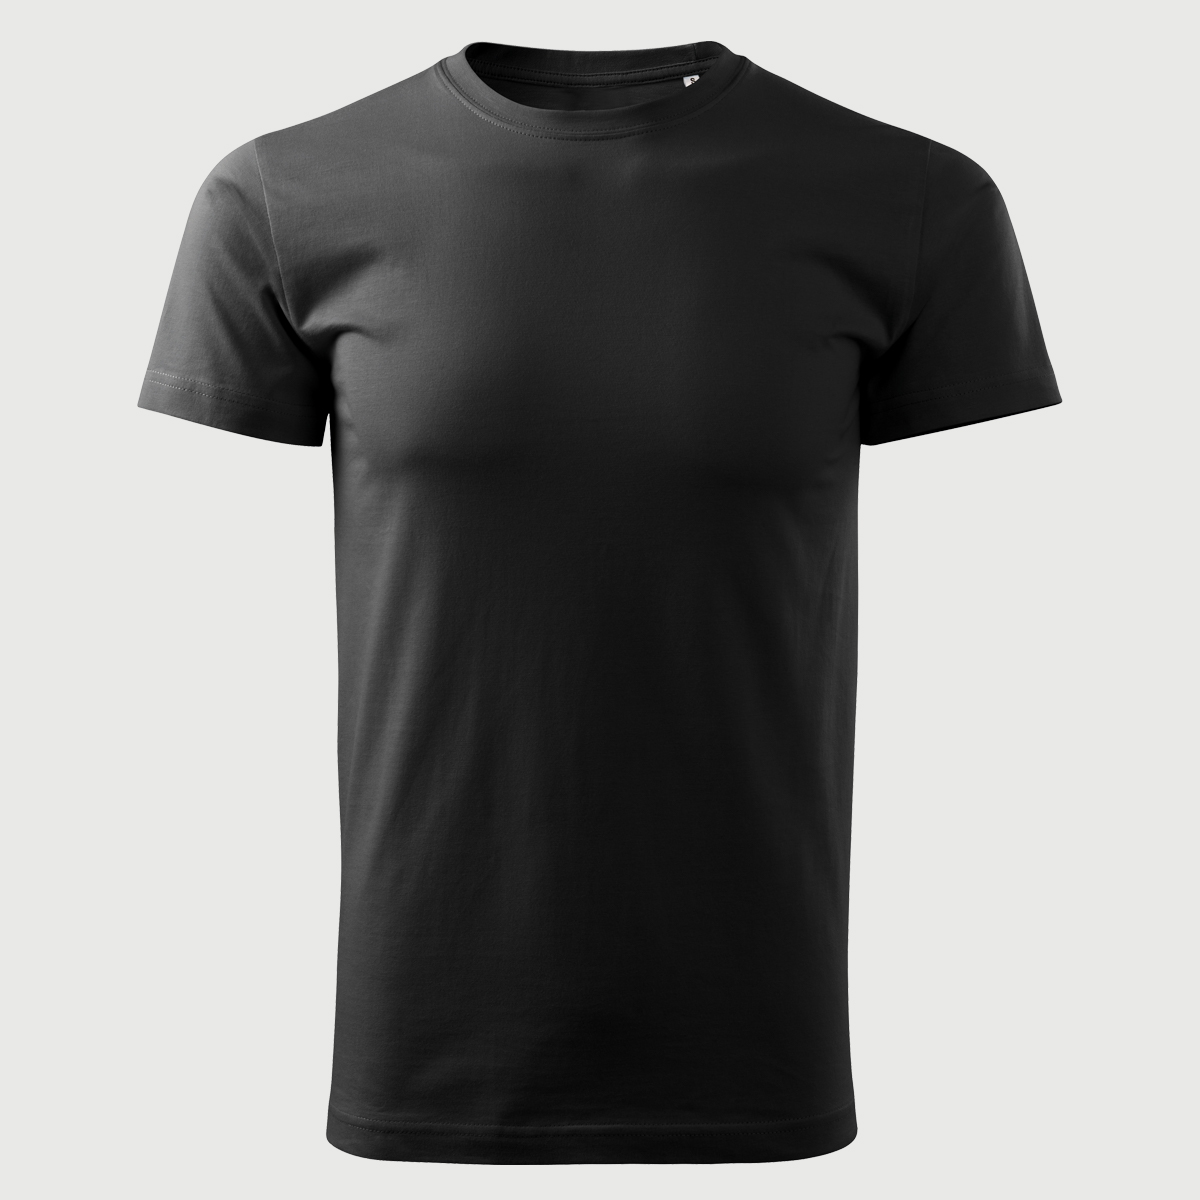 Tricou Personalizabil Barbati